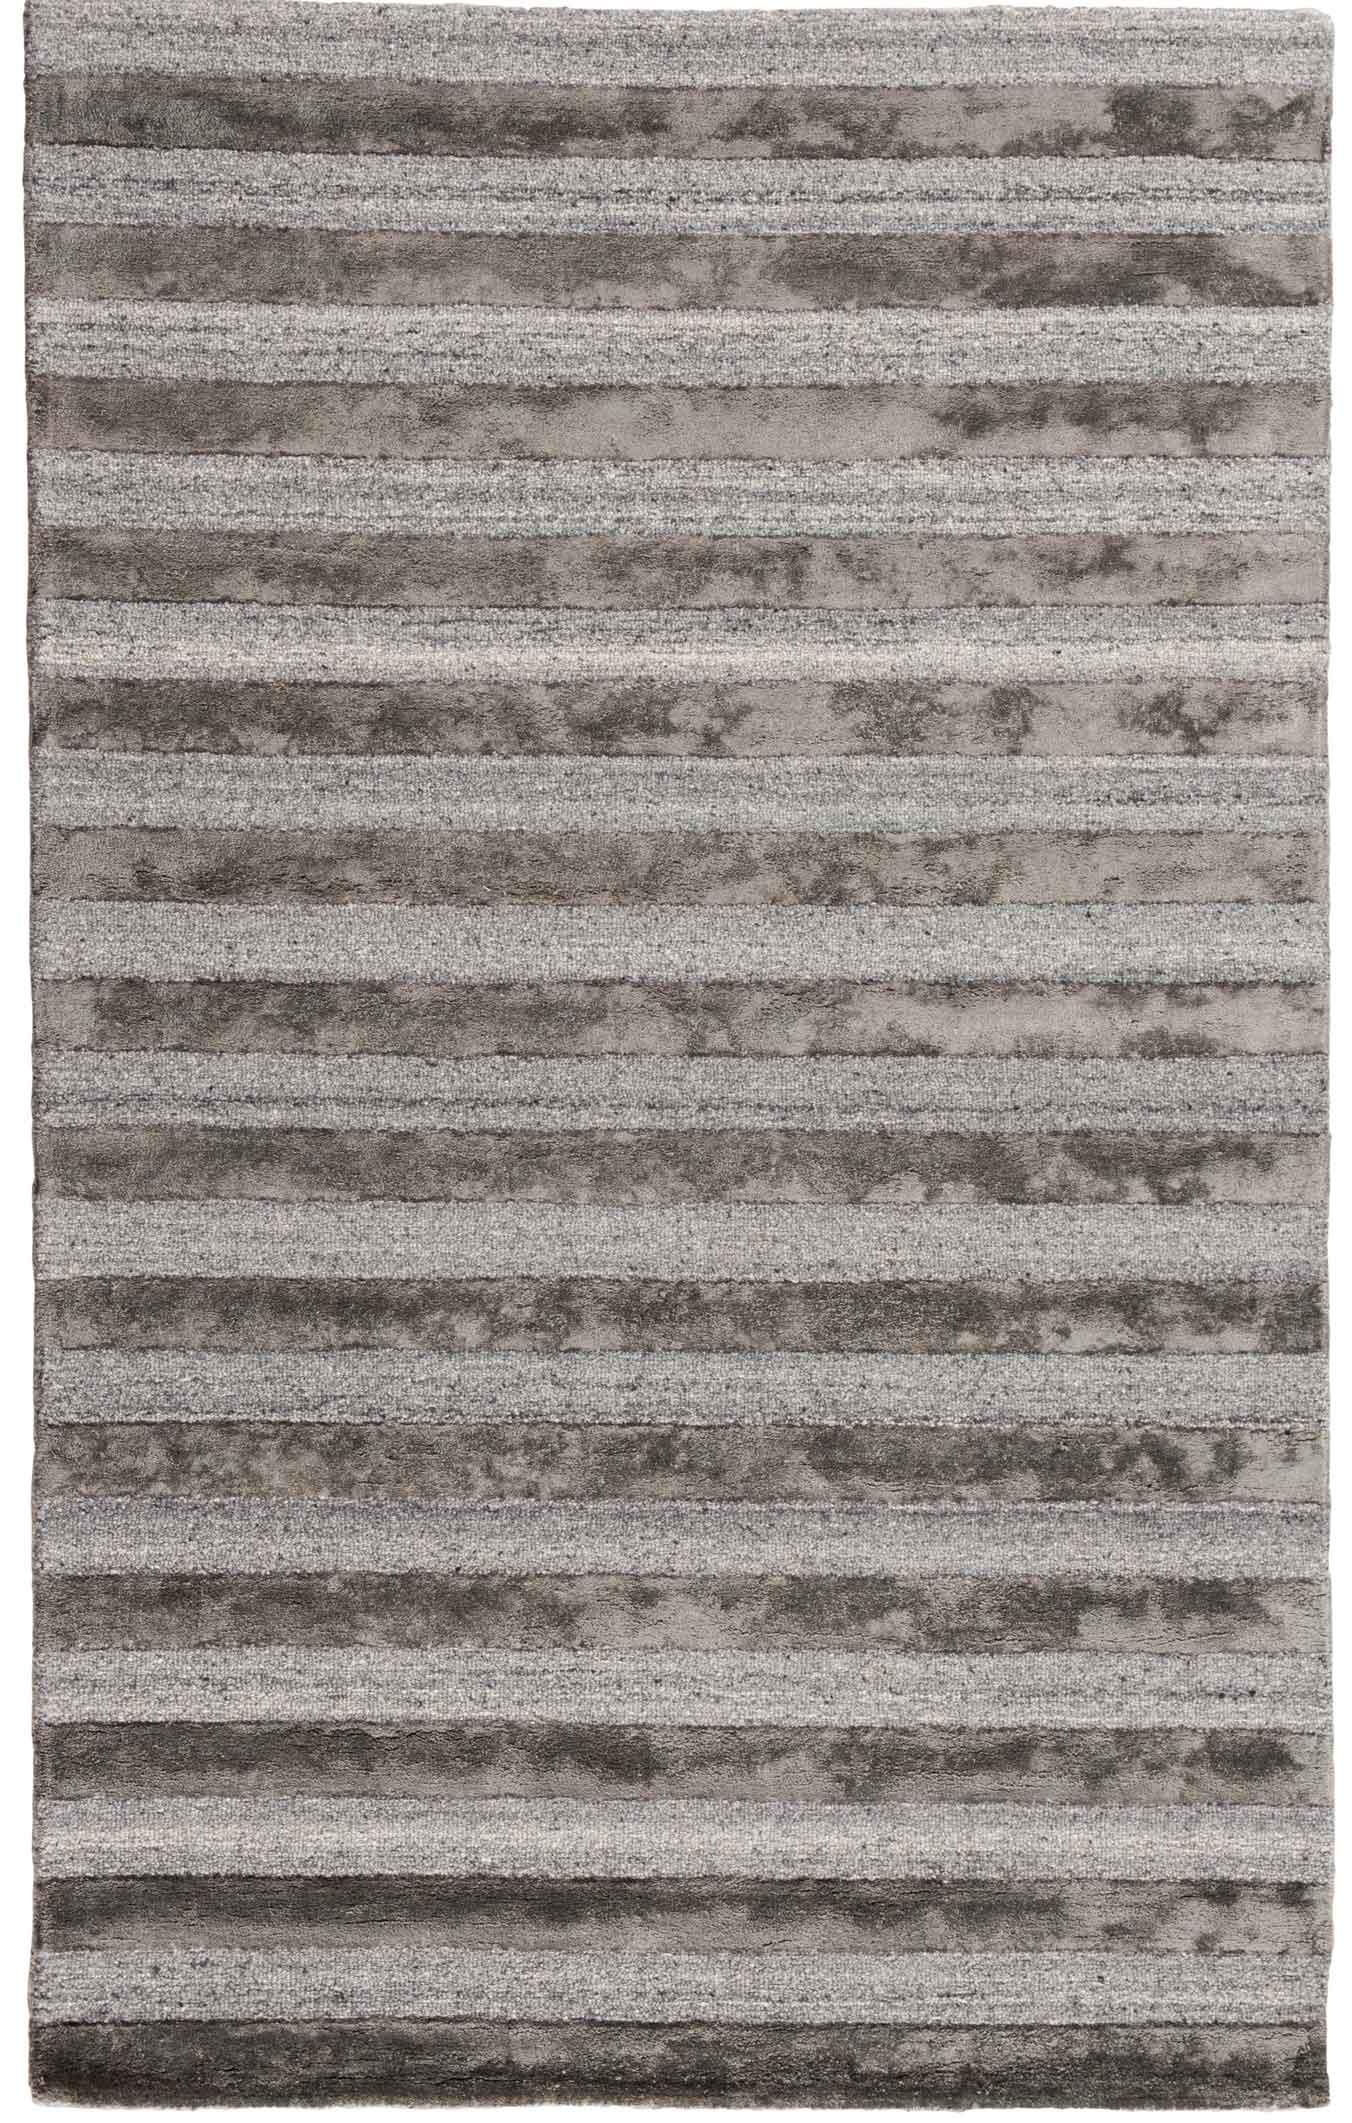 Shimmer-Lines-Charcoal_full